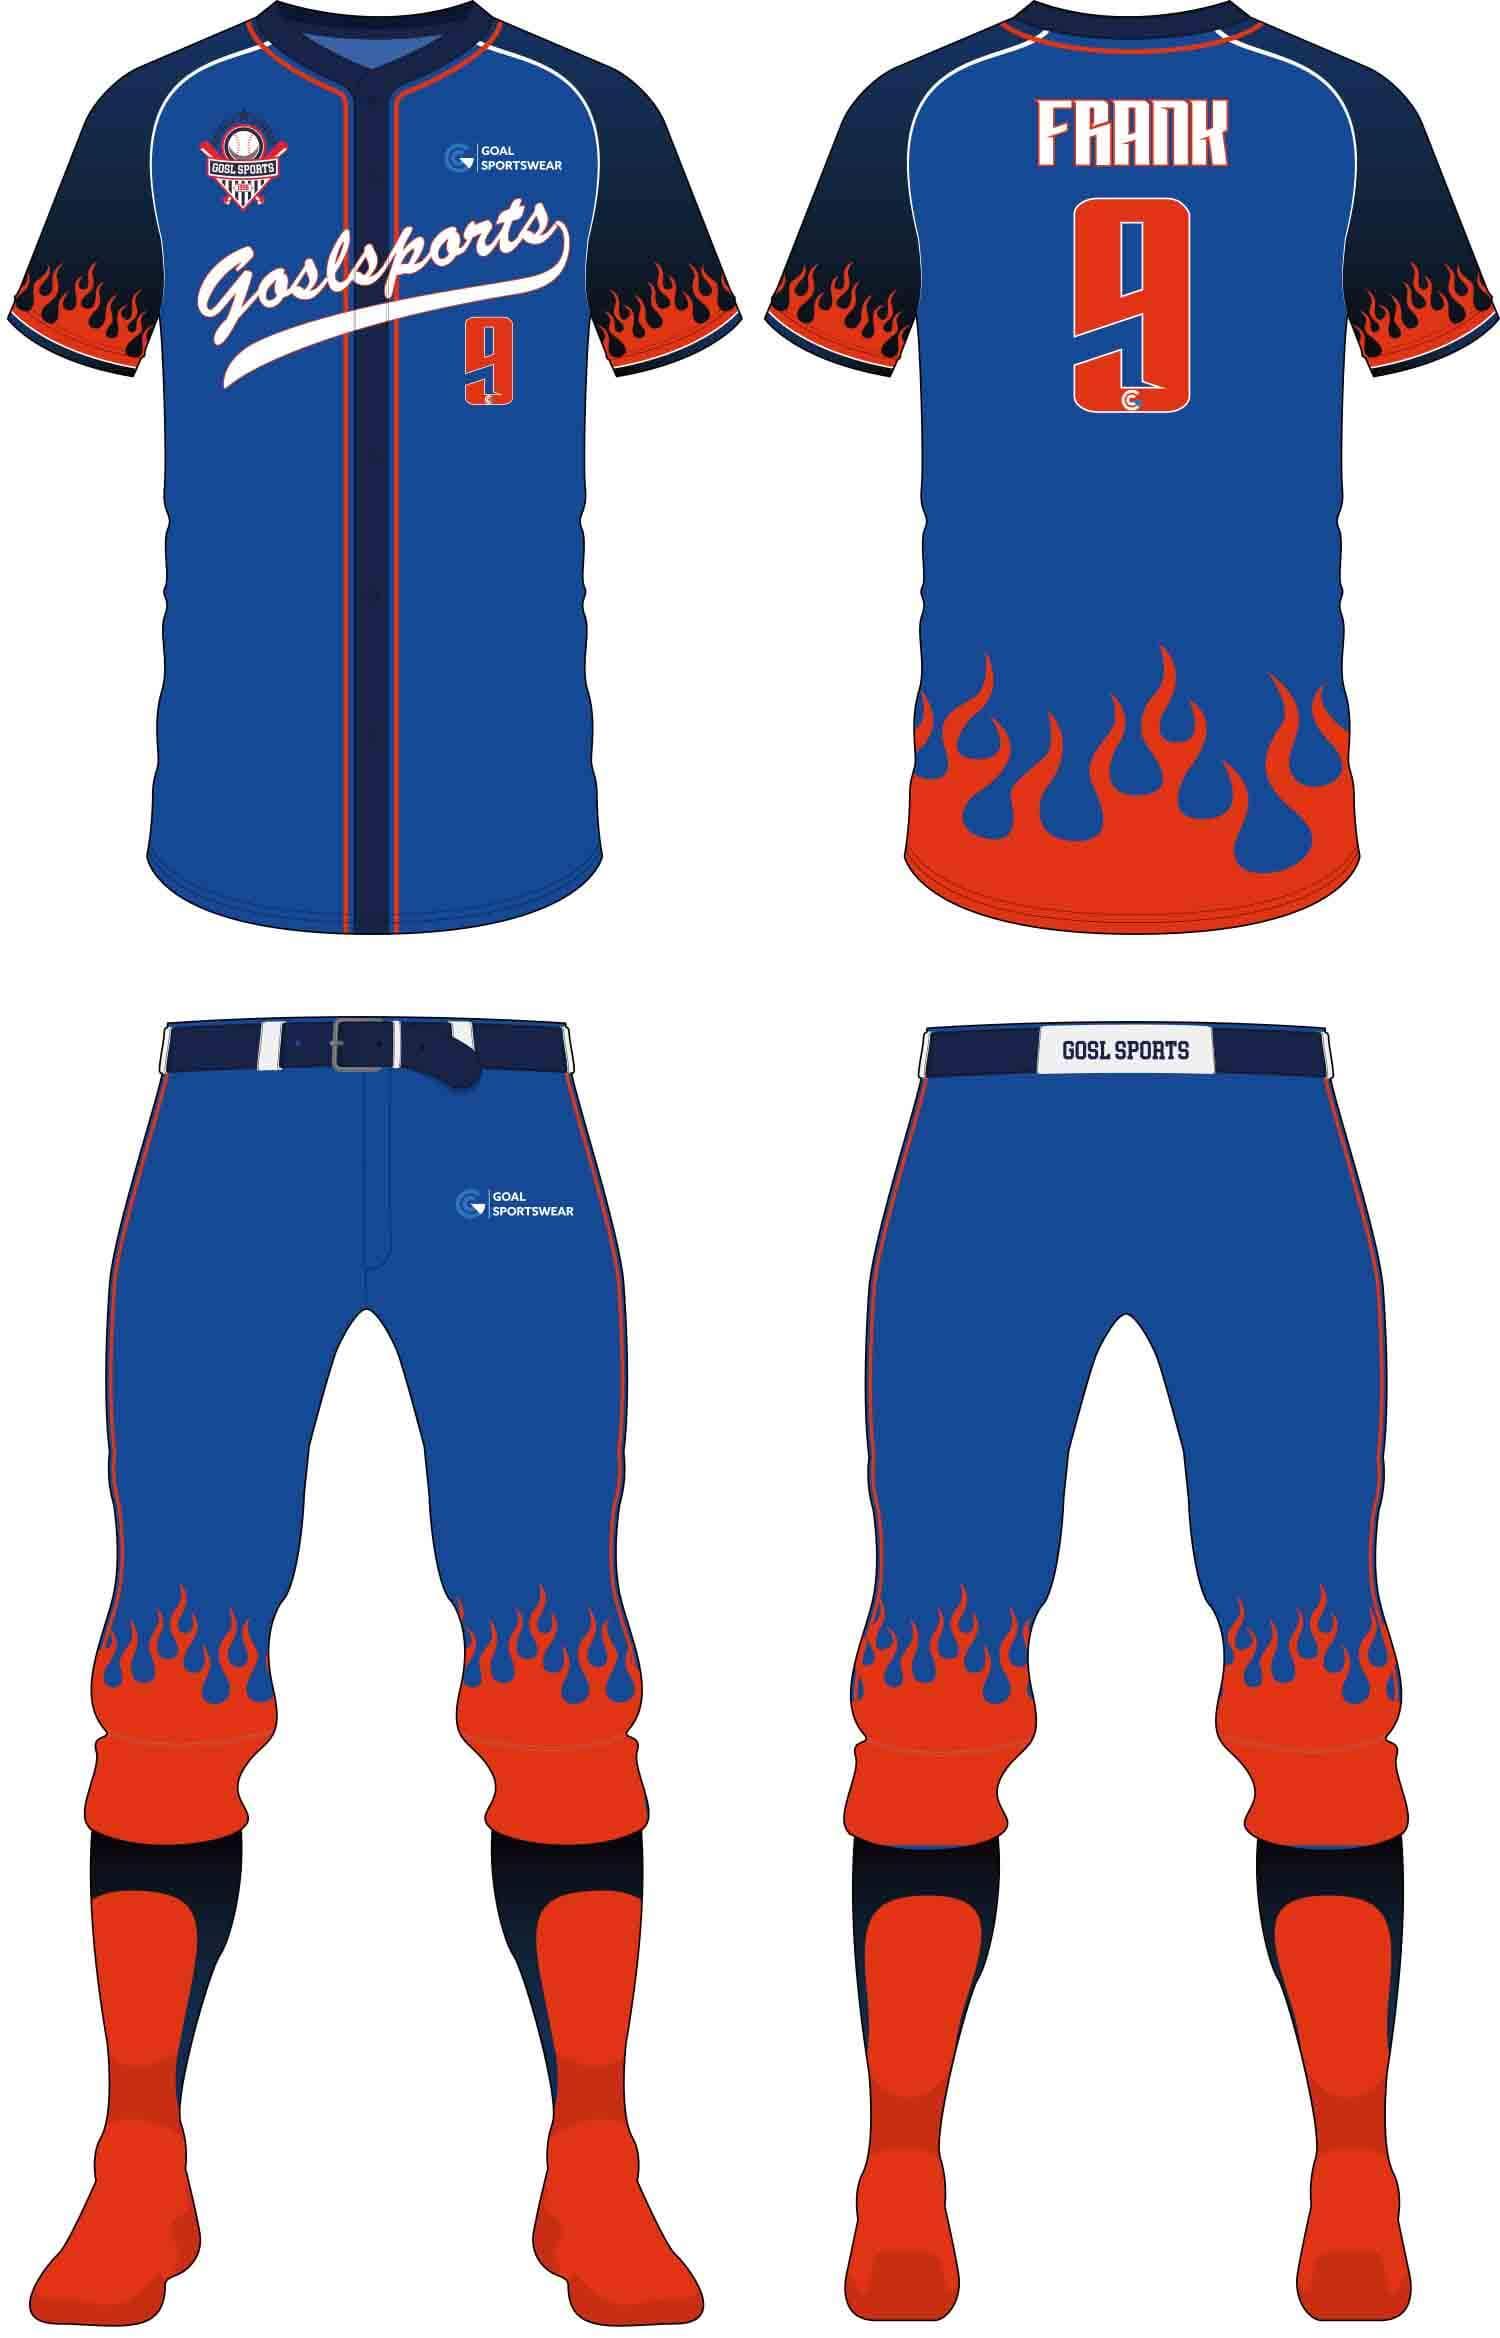 Full dye sublimation wholesale custom Custom Youth Softball Uniforms